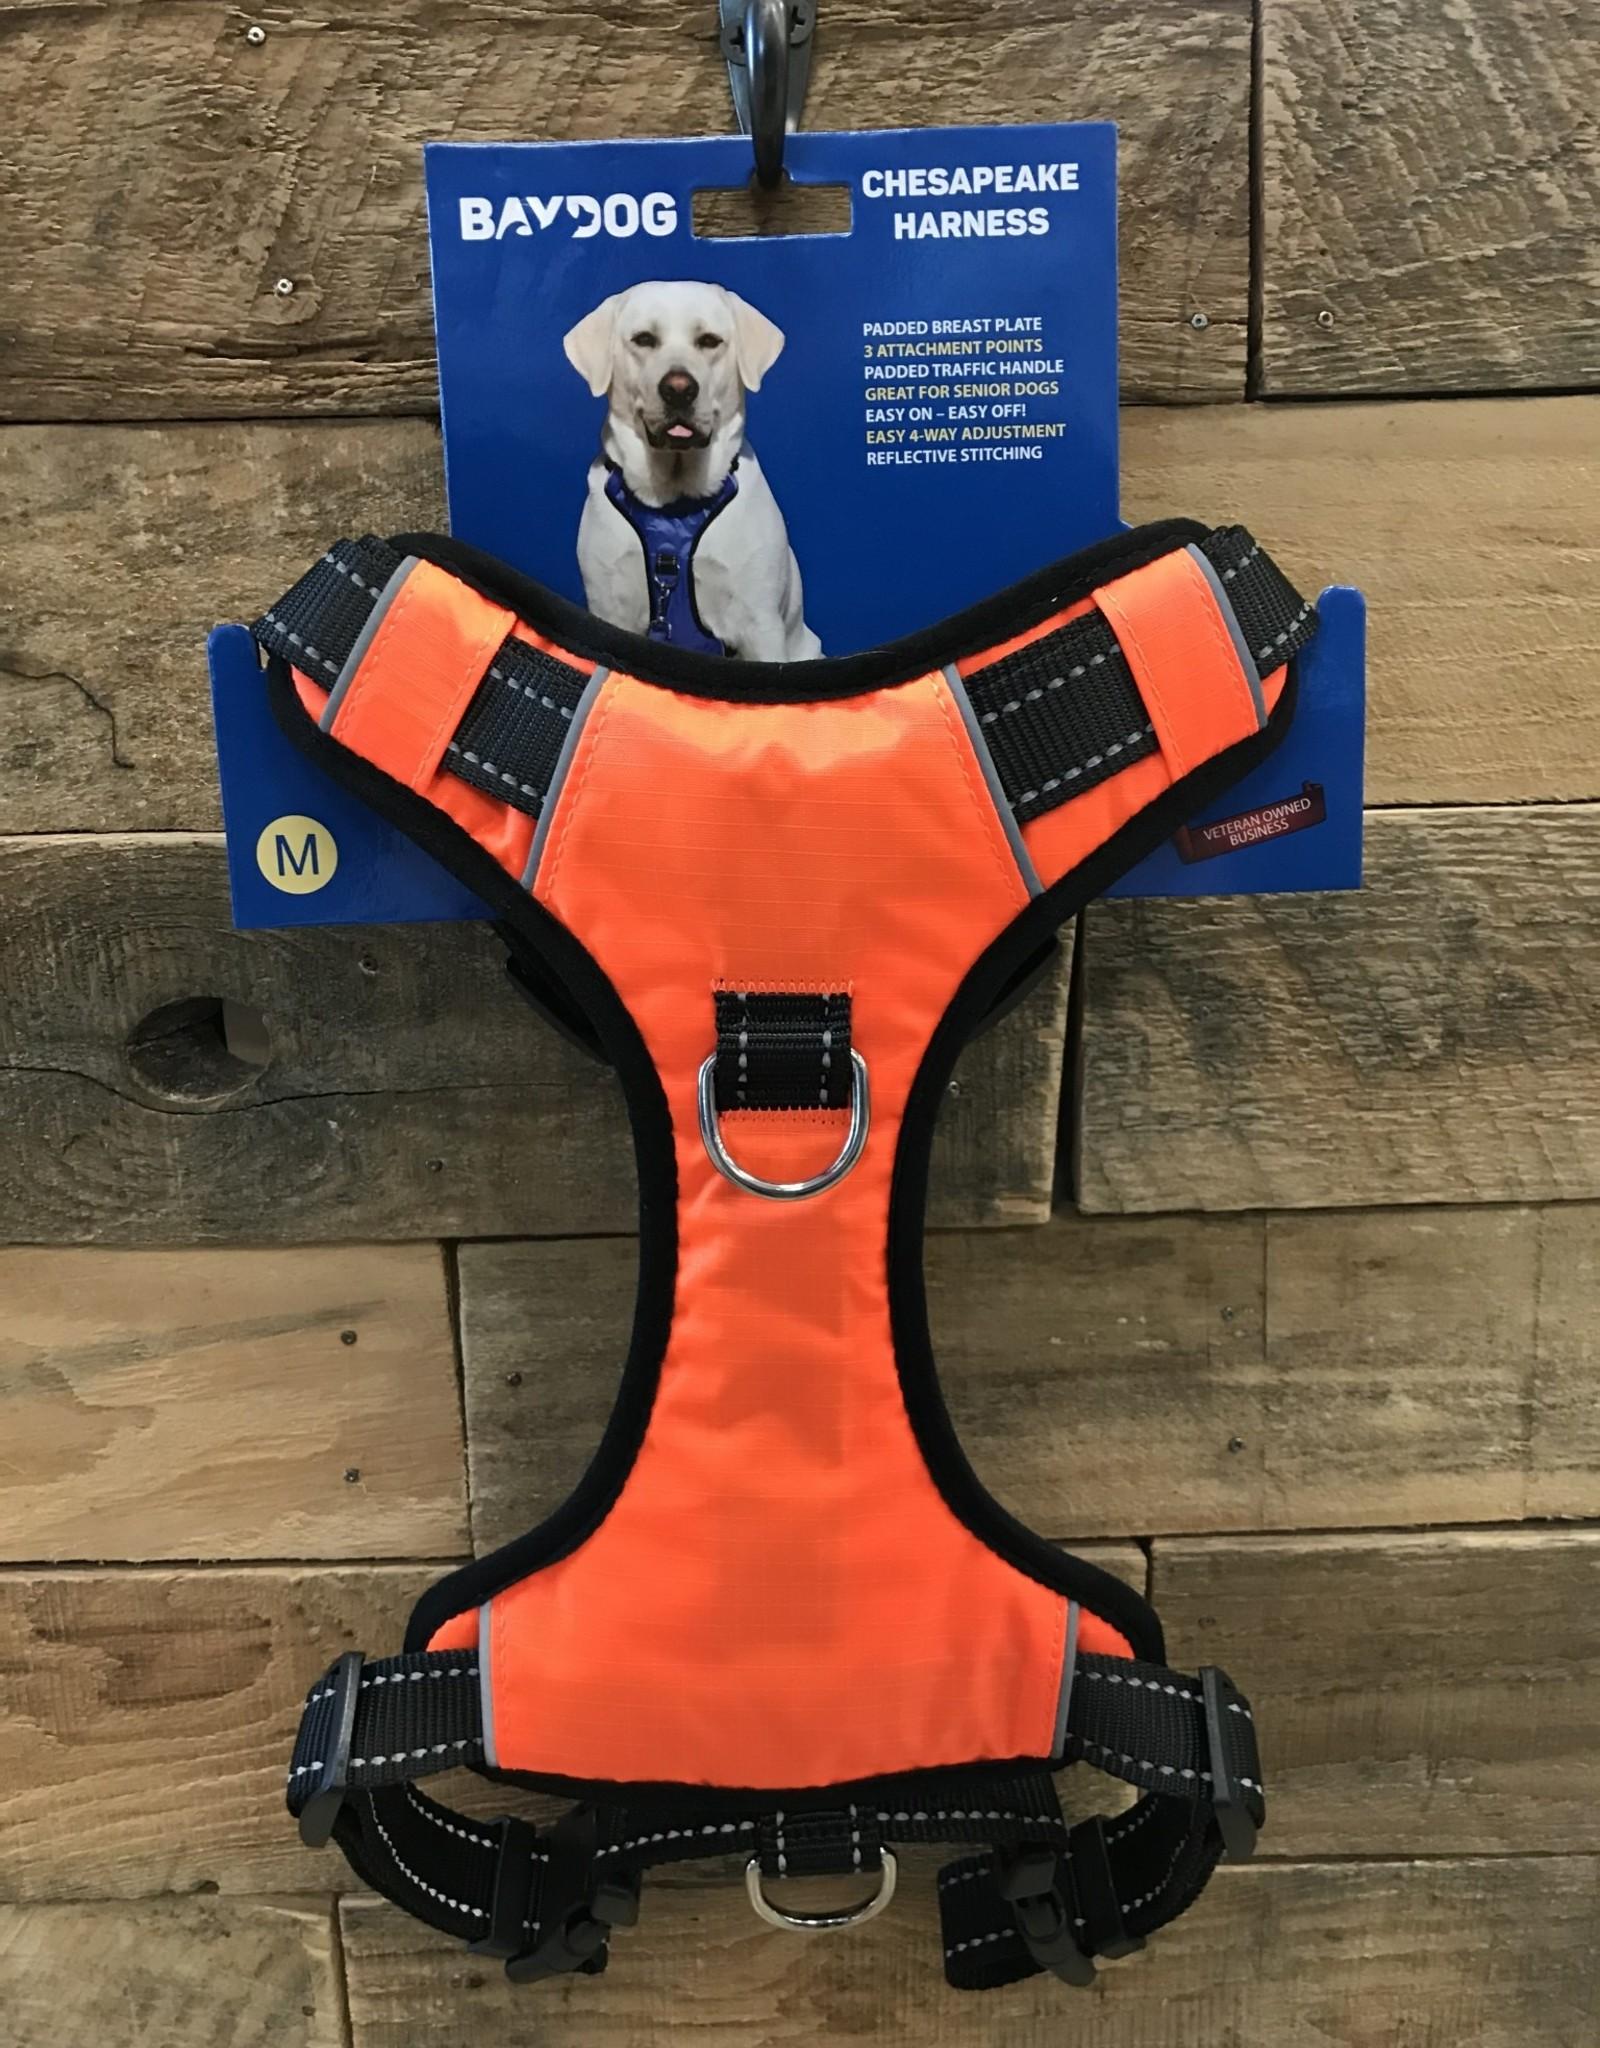 Baydog Baydog Chesapeake Medium Harness - 8 colors